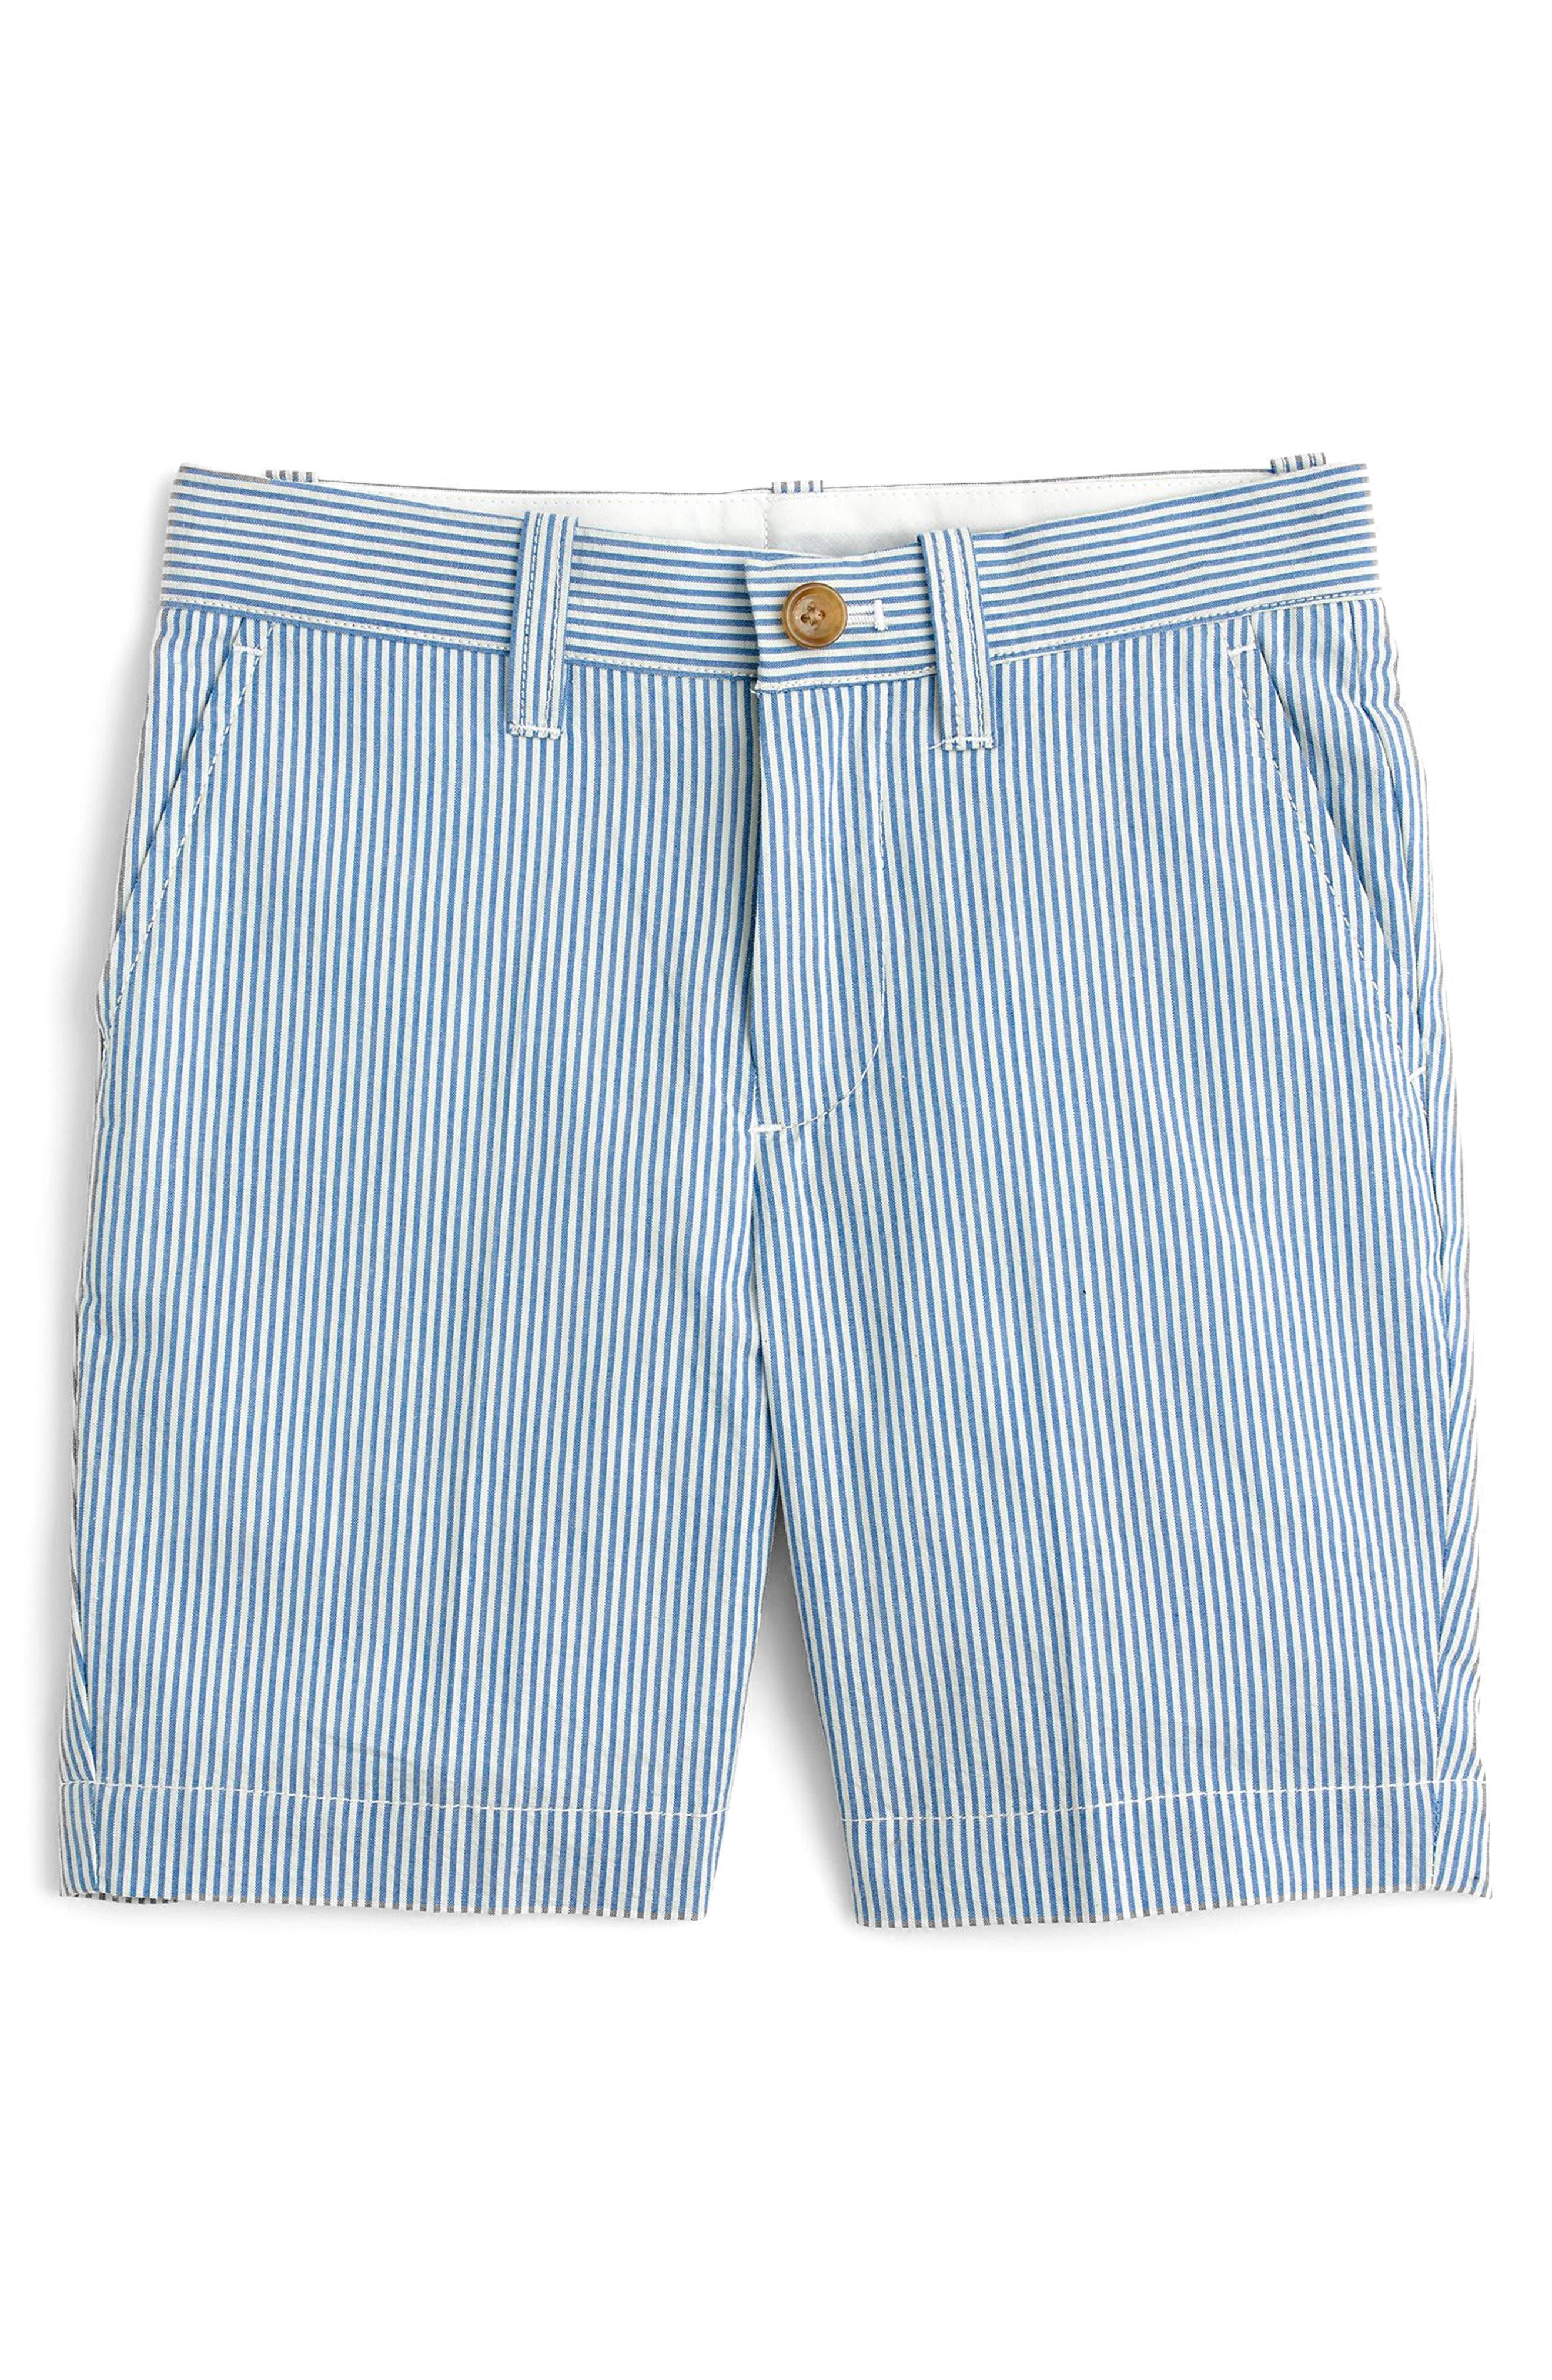 Seersucker Shorts,                             Main thumbnail 1, color,                             Crisp Azure White